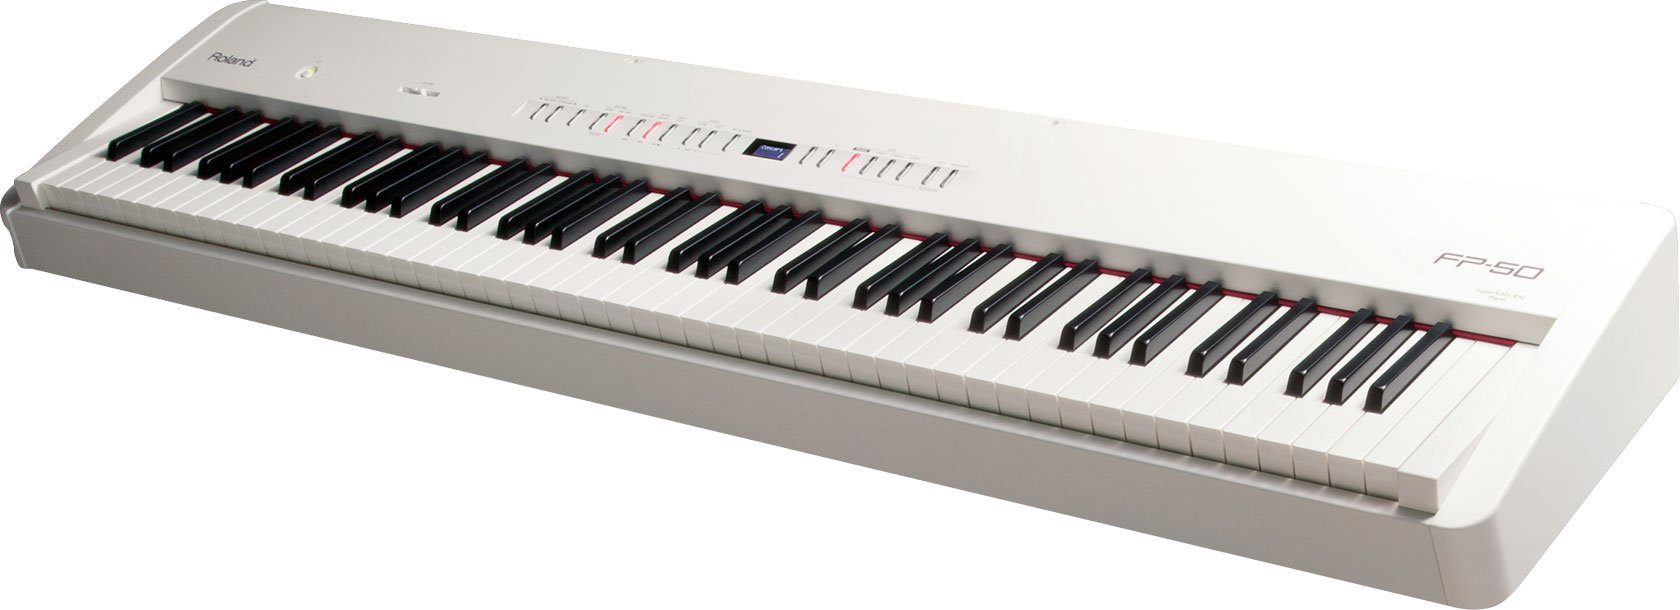 Suzuki Digital Piano G